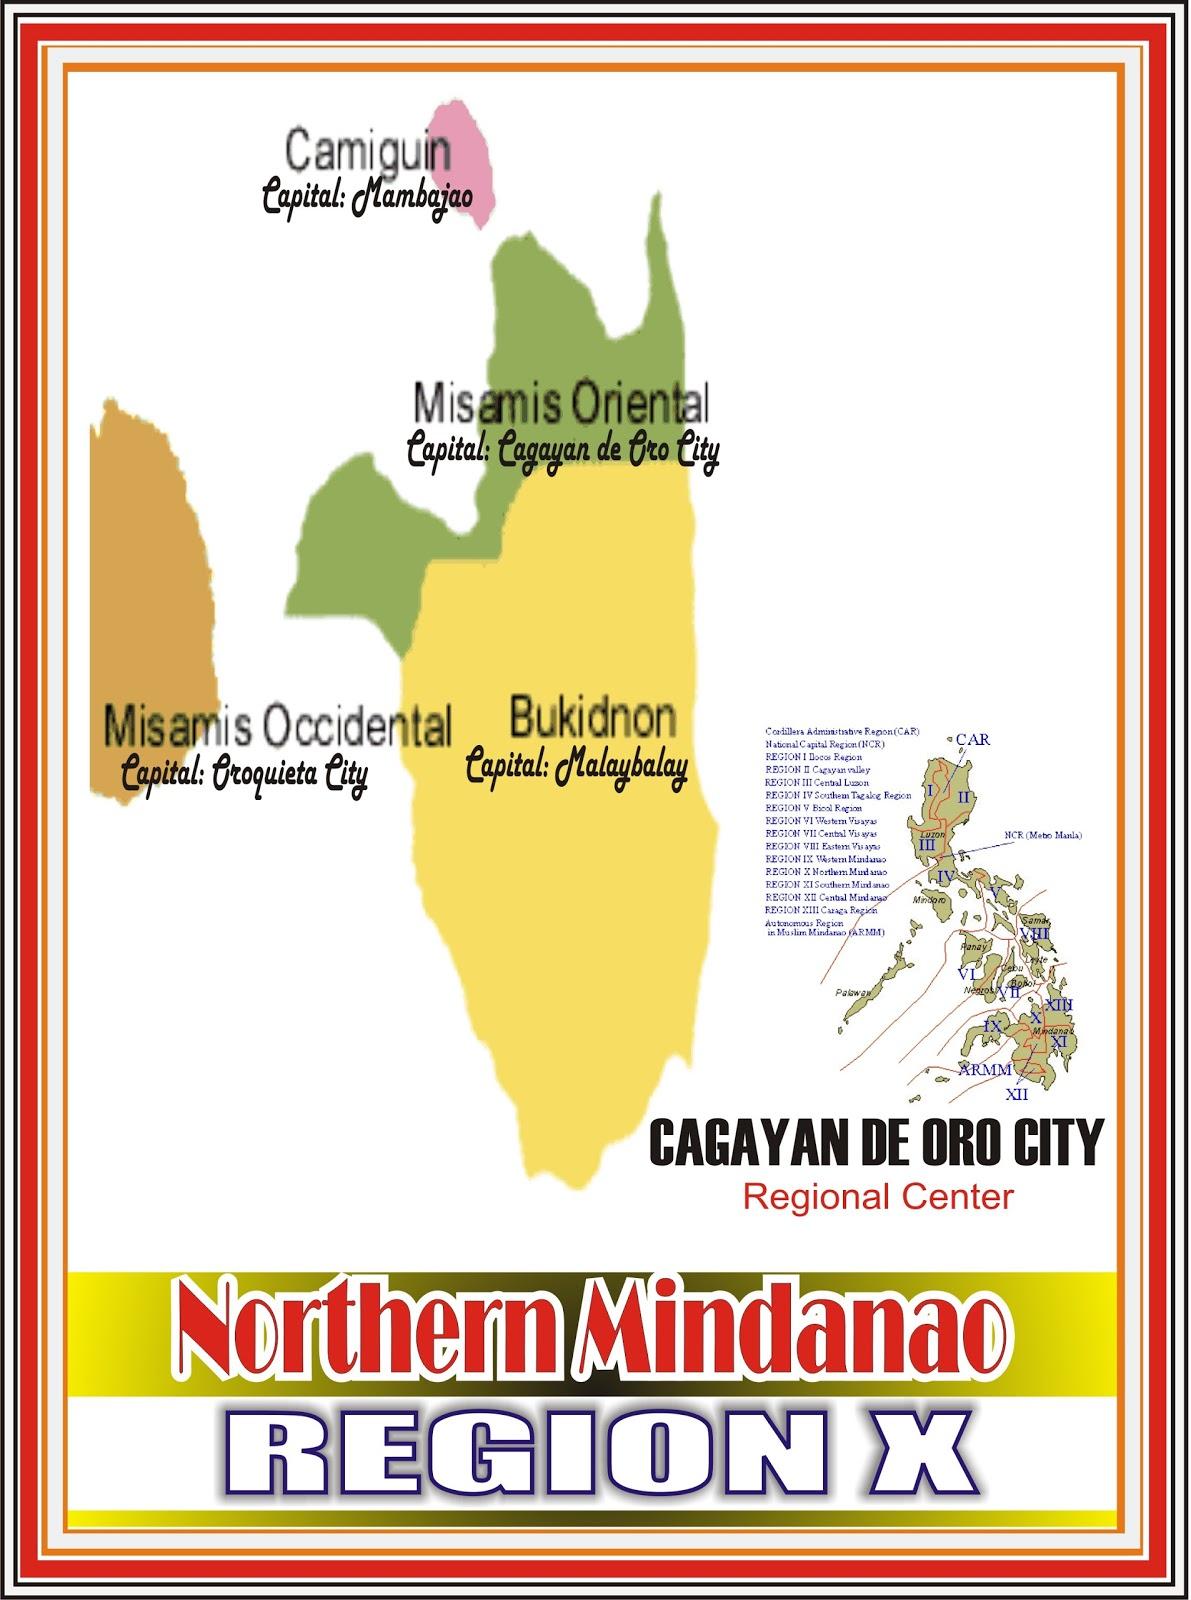 Mindanao Philippine Map with Regions